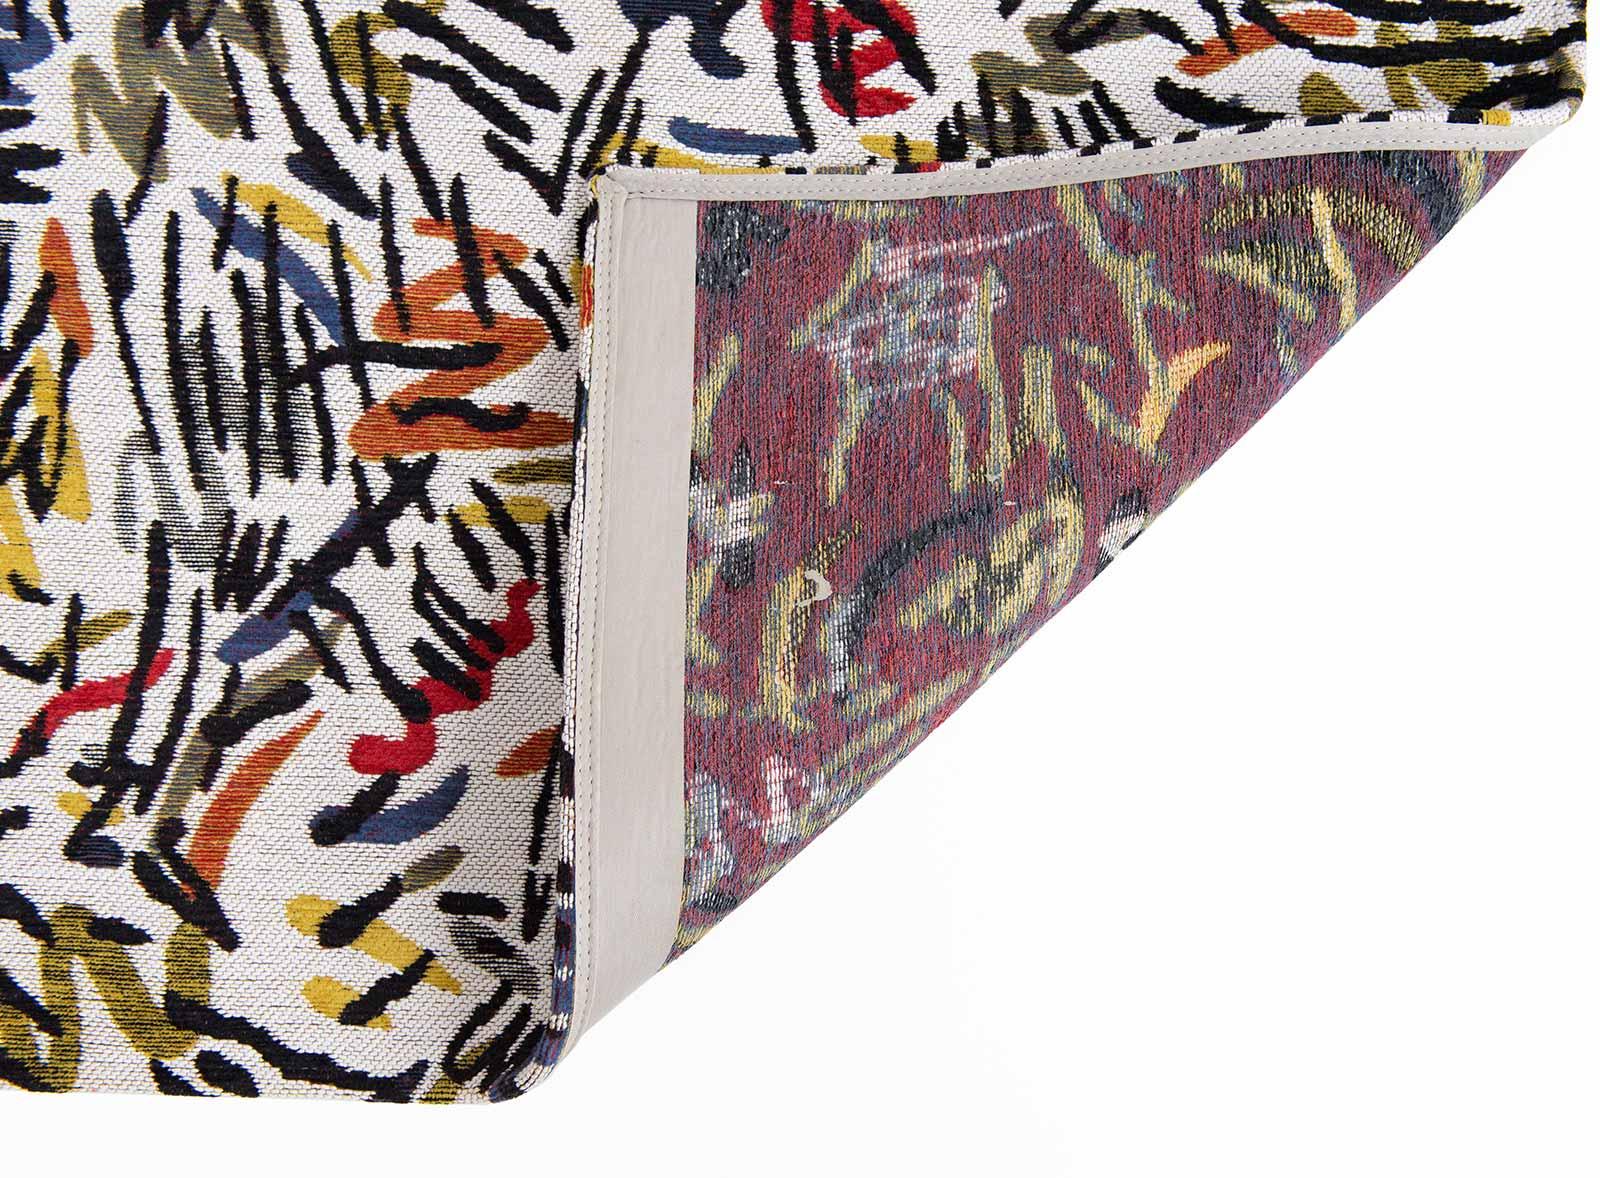 Louis De Poortere rug CS 9144 Gallery Graffito Street Graph back